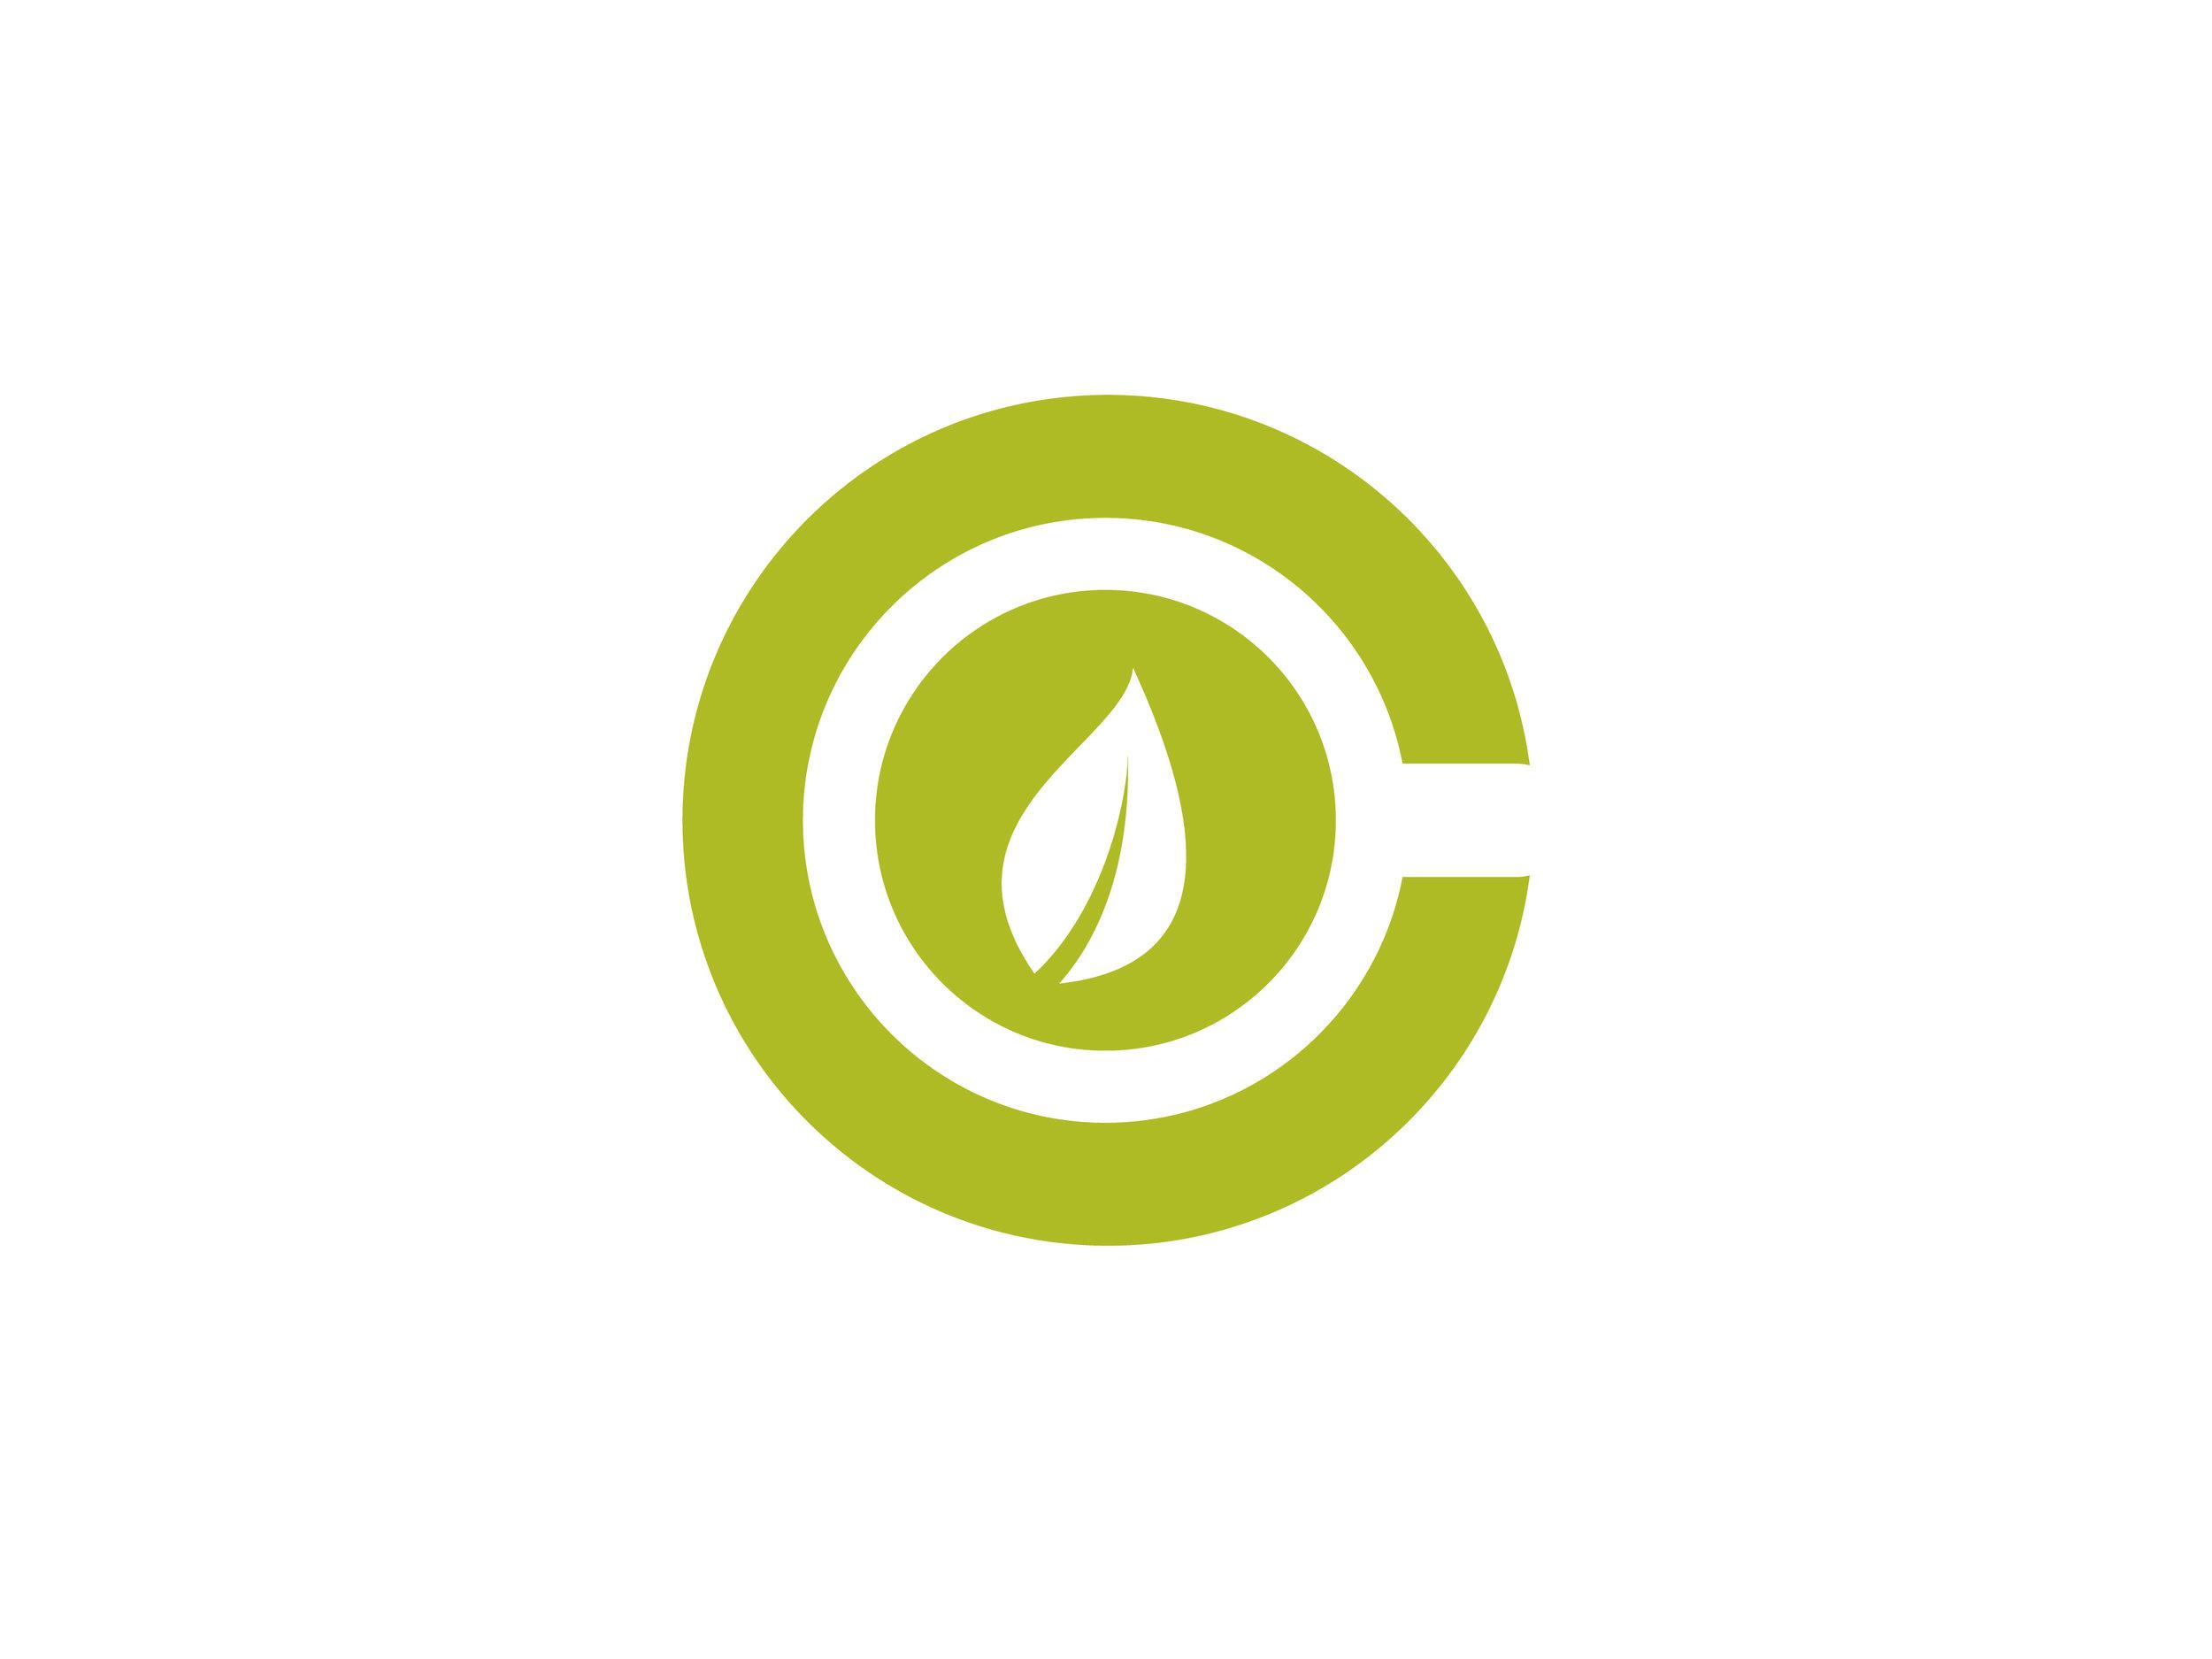 Claritea-logo-designs-03.jpg